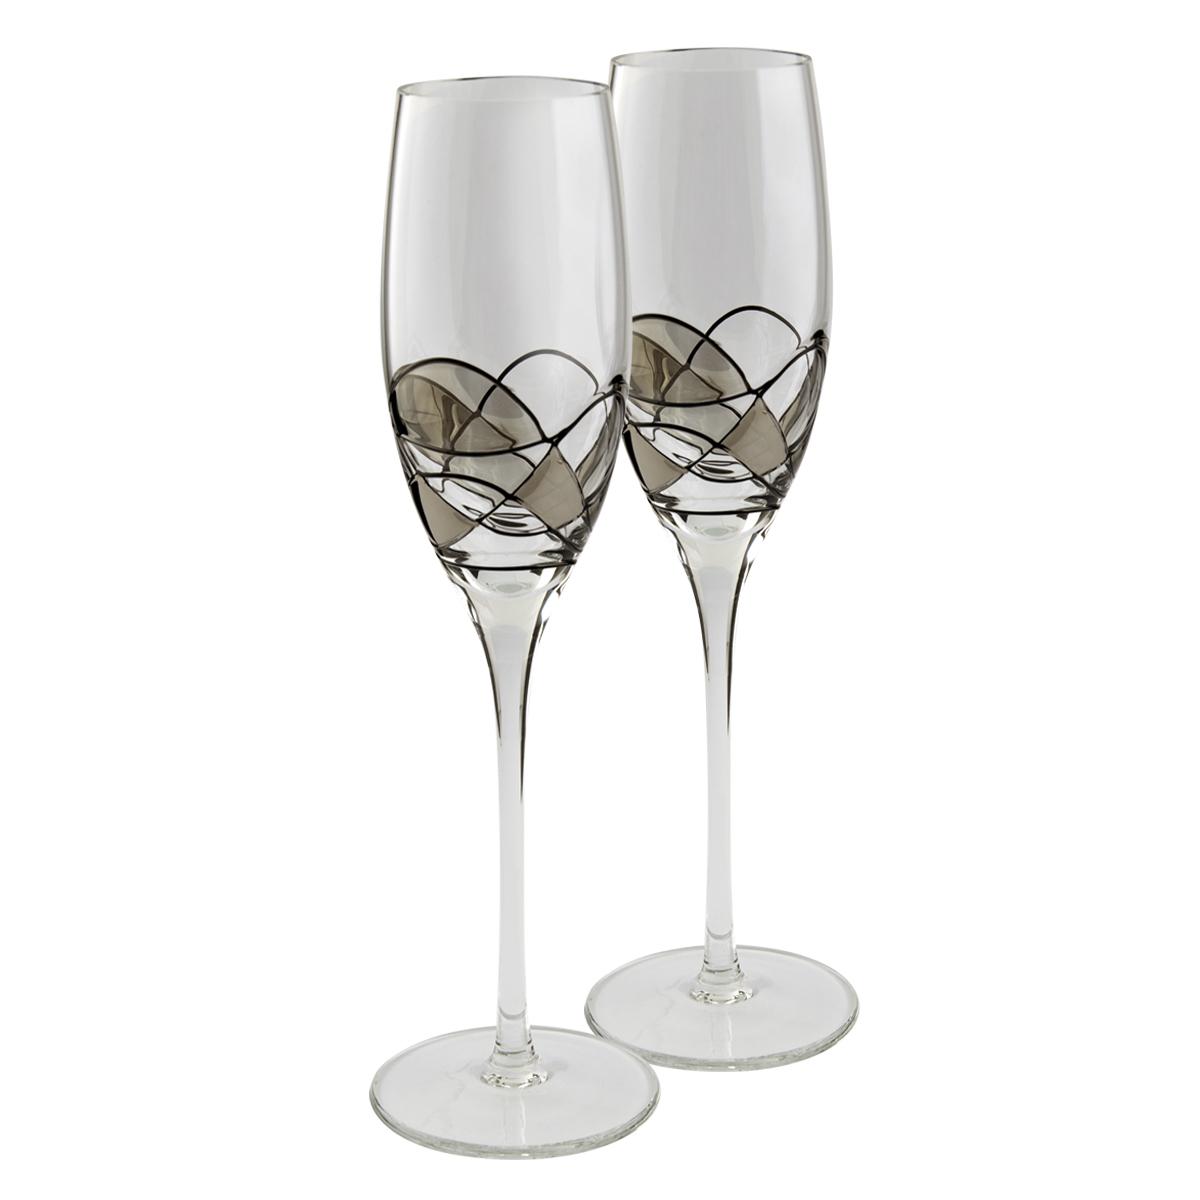 Nobile Silver Mosaic Champagne Glasses Pair Sil M Champ